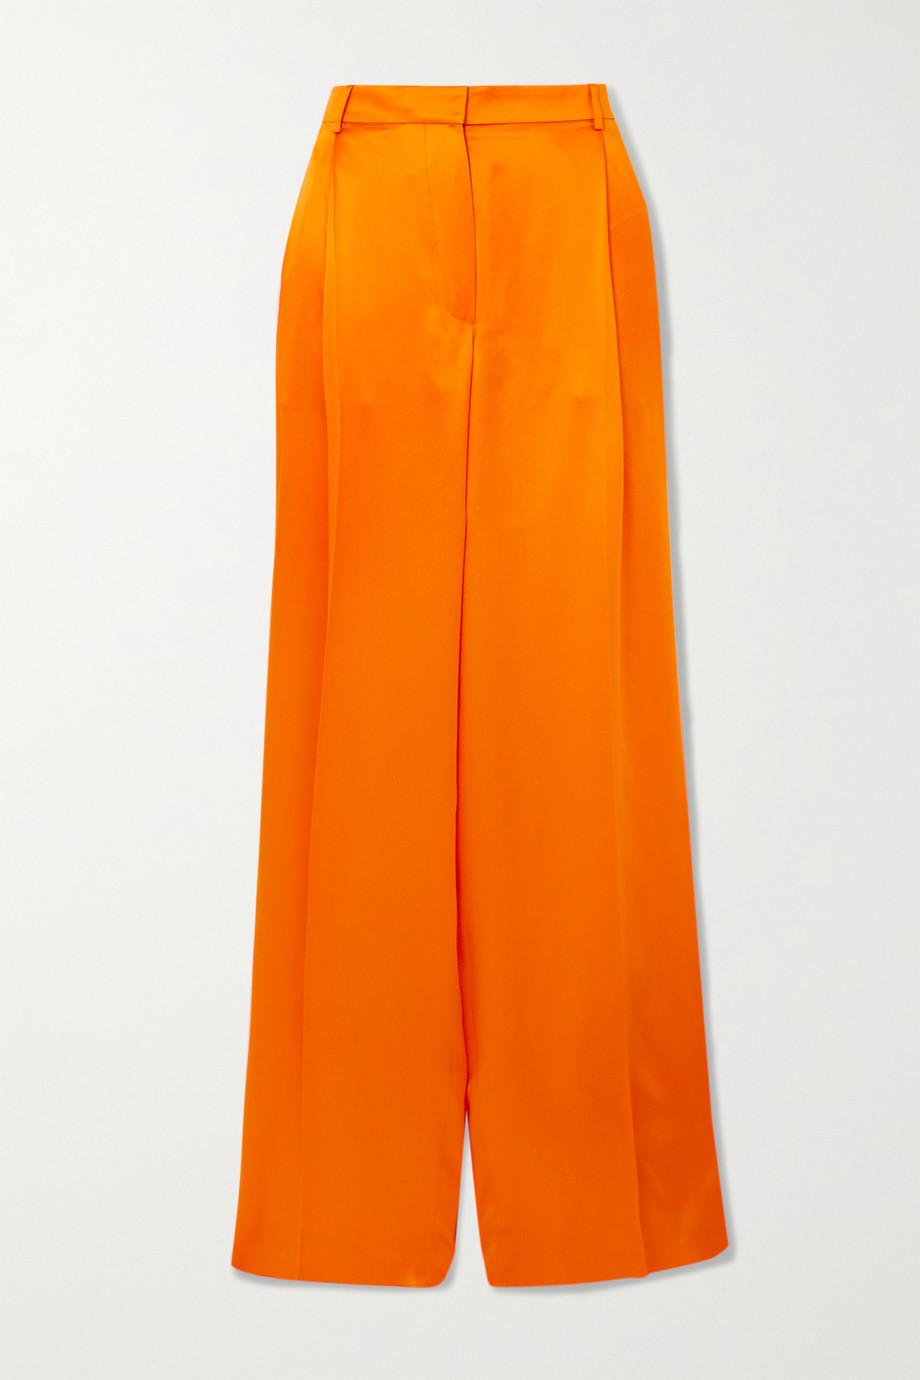 Nina Ricci Pleated silk-satin wide-leg pants